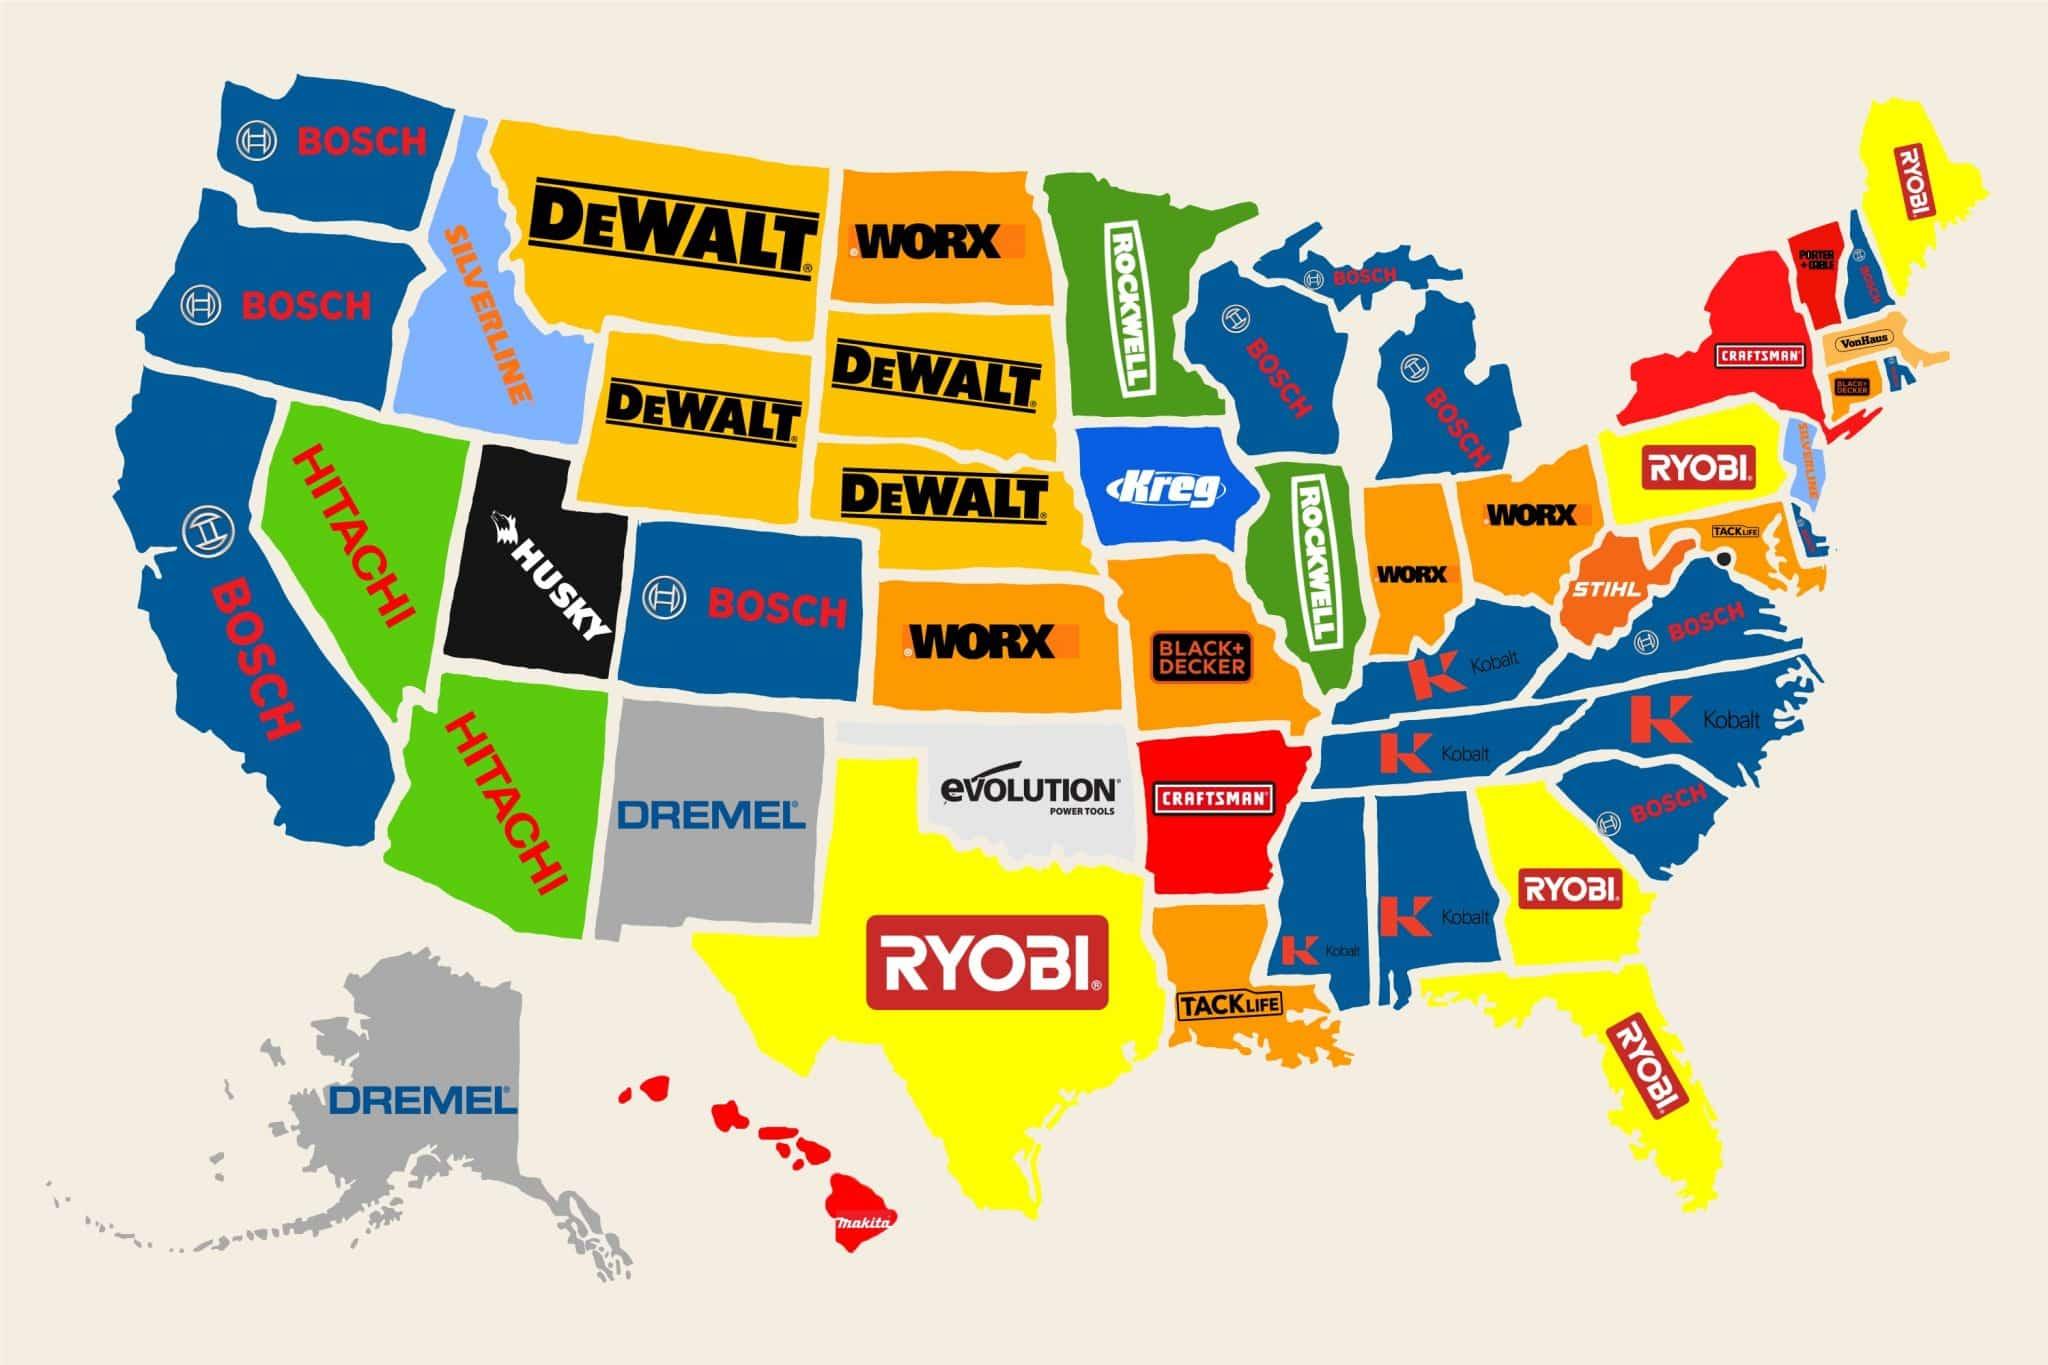 Most popular power tool brands